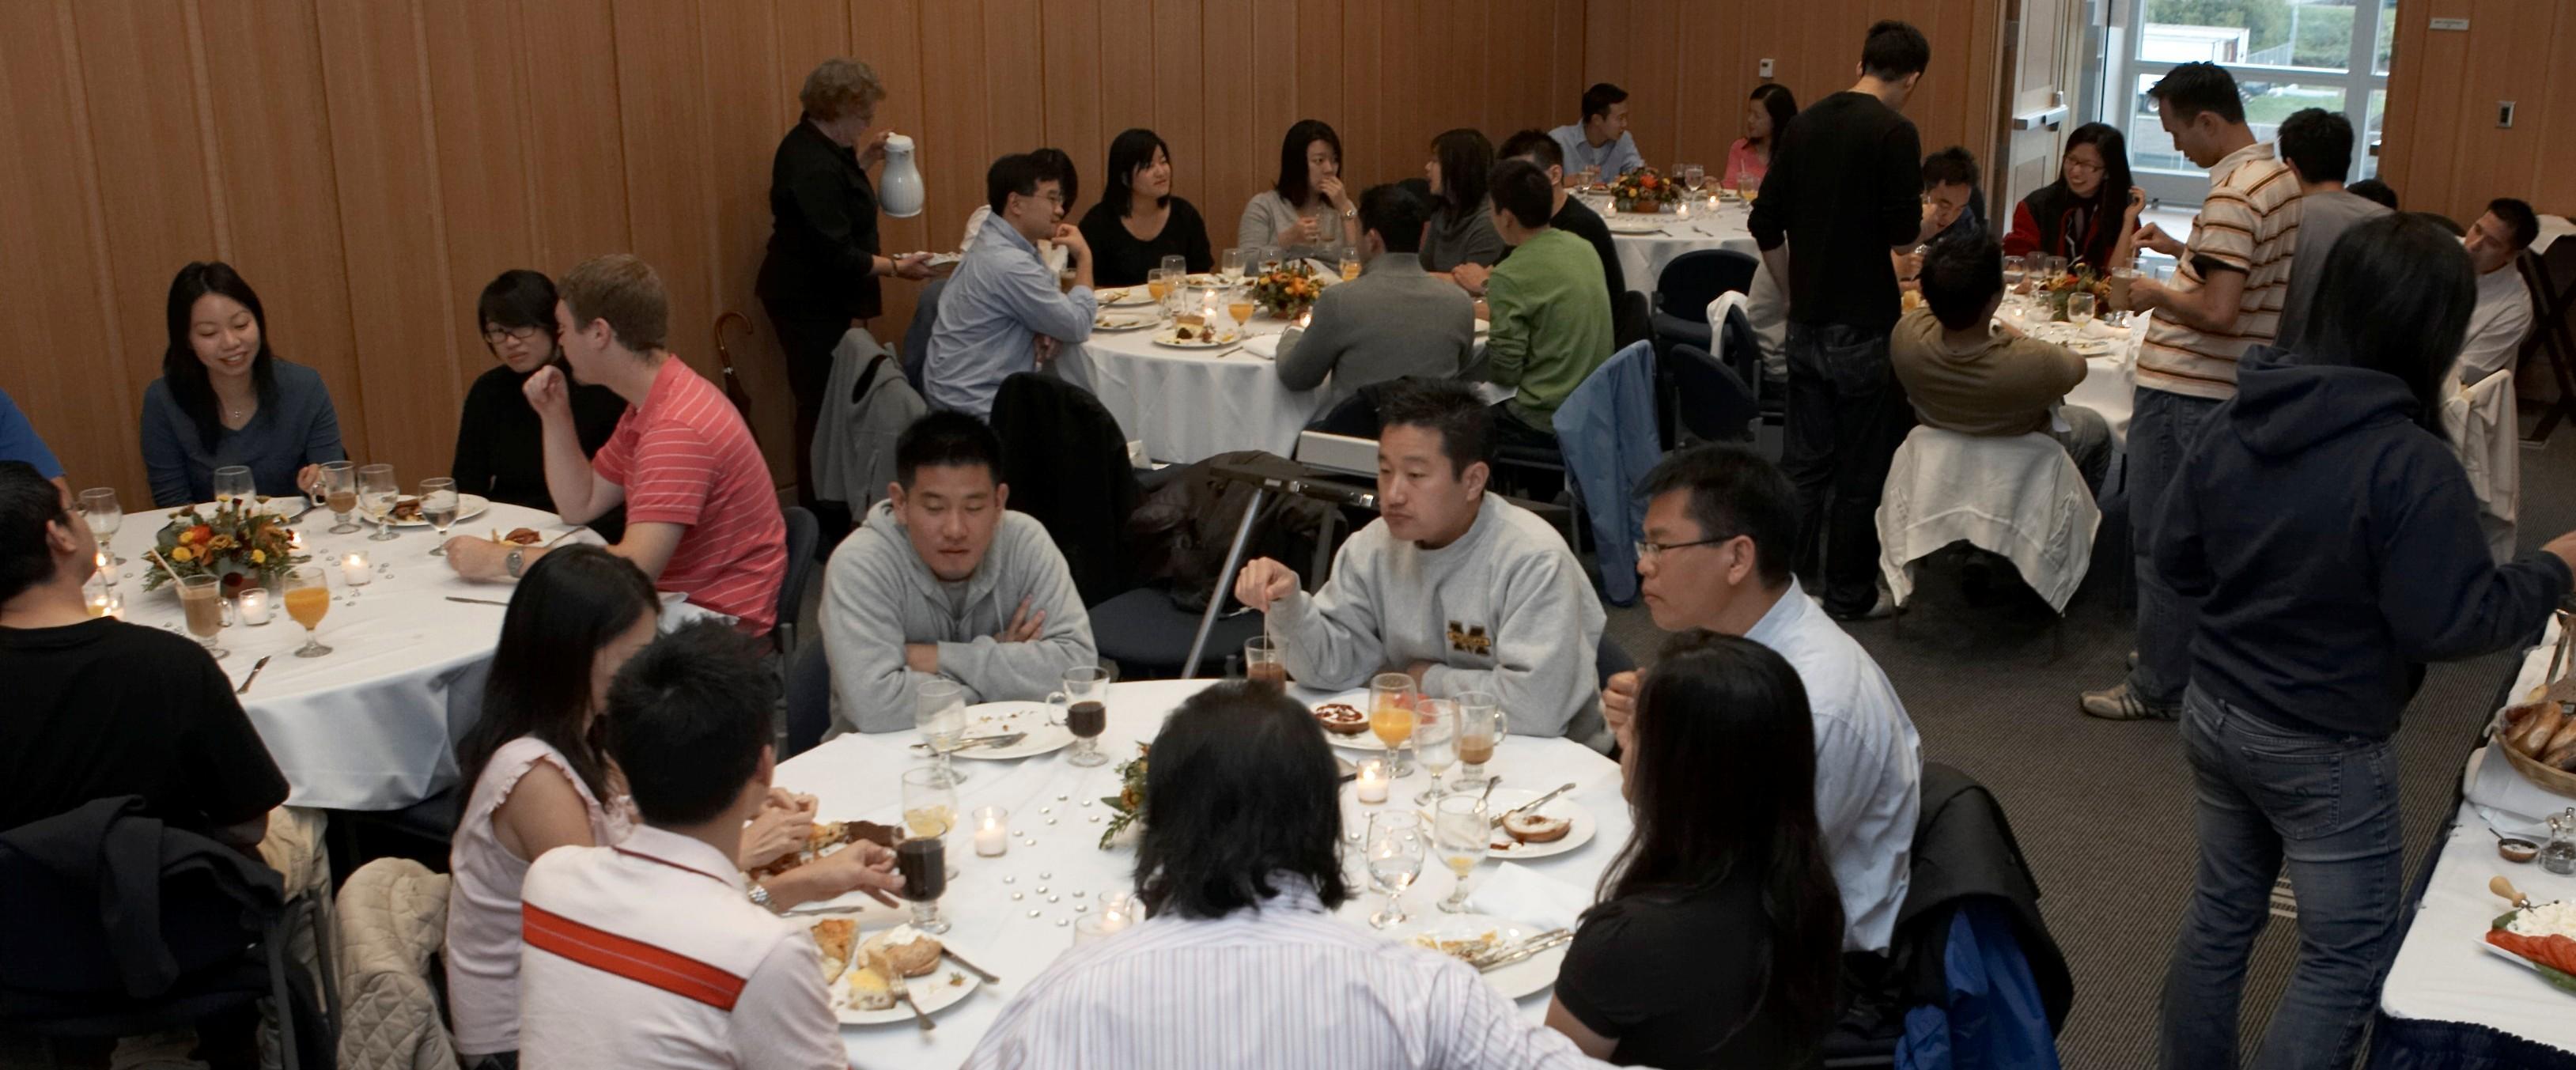 Alumni Banquet1.jpg